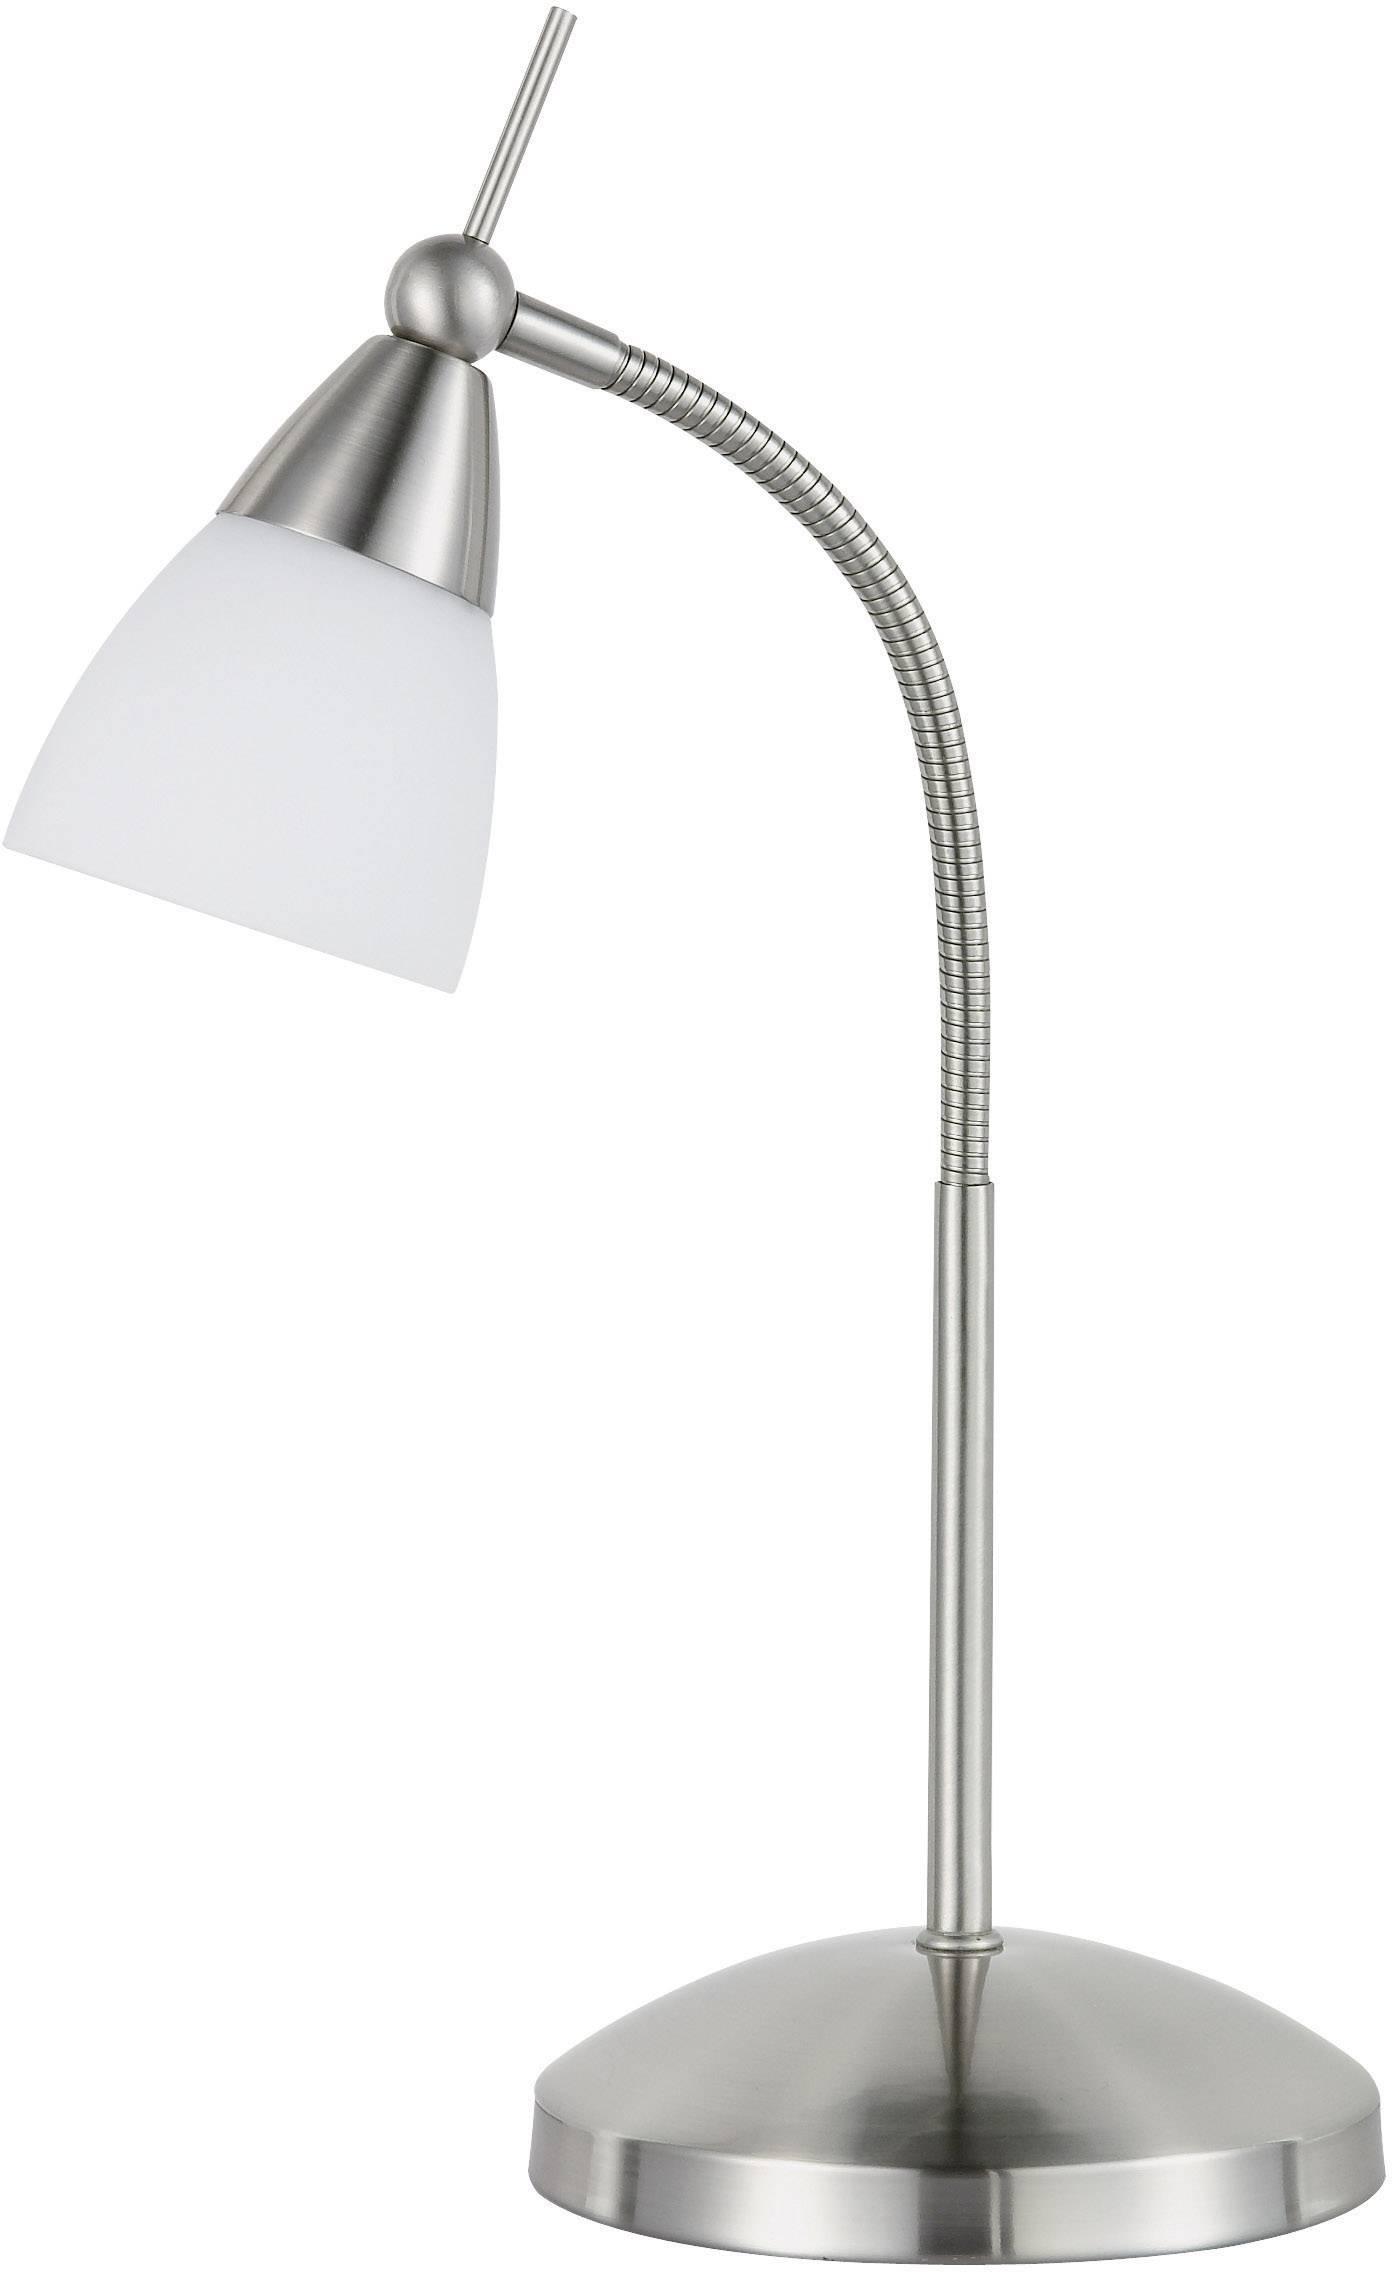 bedlamp eco halogeen g9 28 w paul neuhaus pino 4430 55 staal. Black Bedroom Furniture Sets. Home Design Ideas